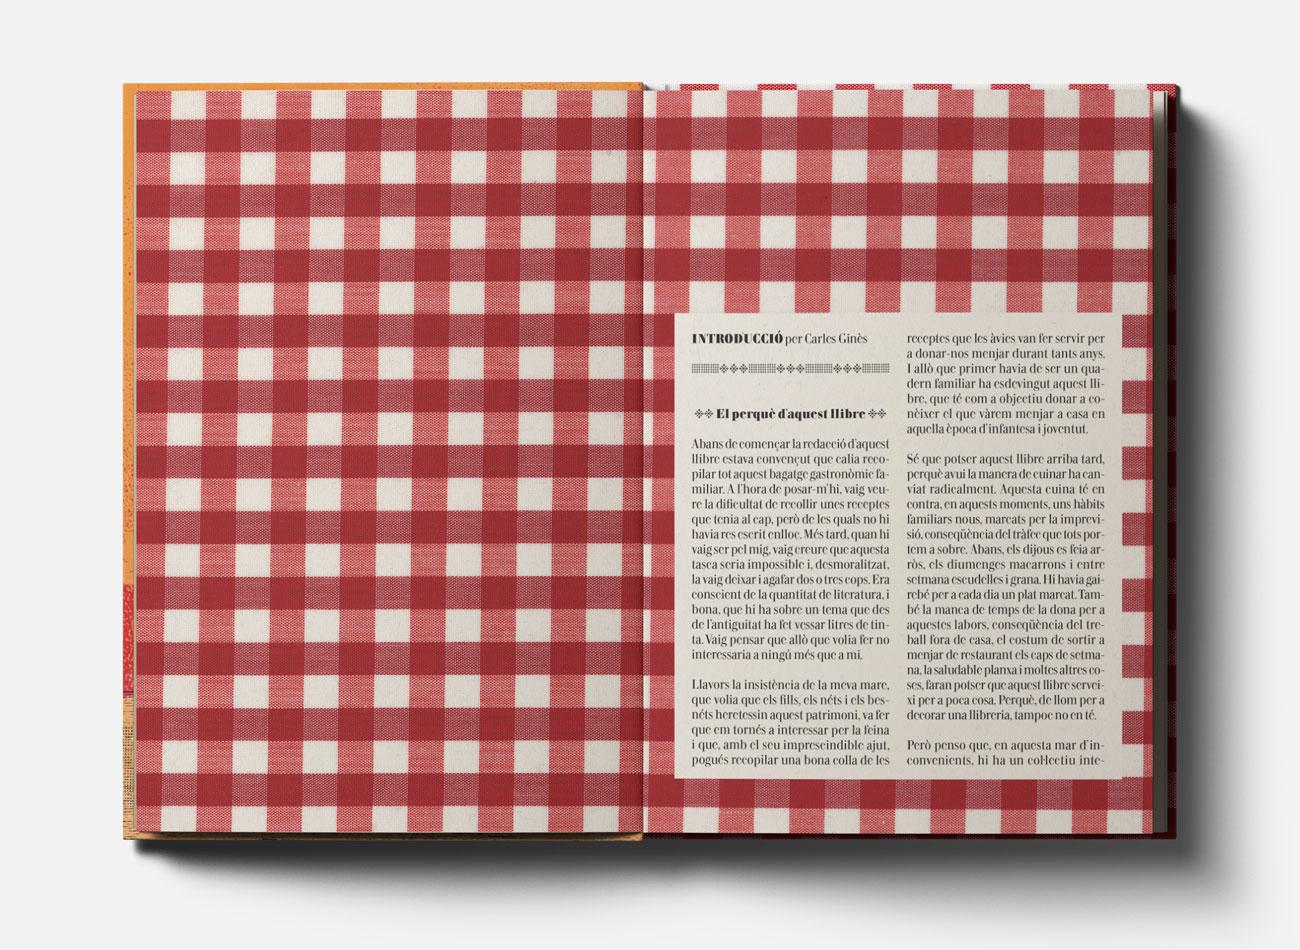 Silvia Miguez-Book-El que es menjava a casa